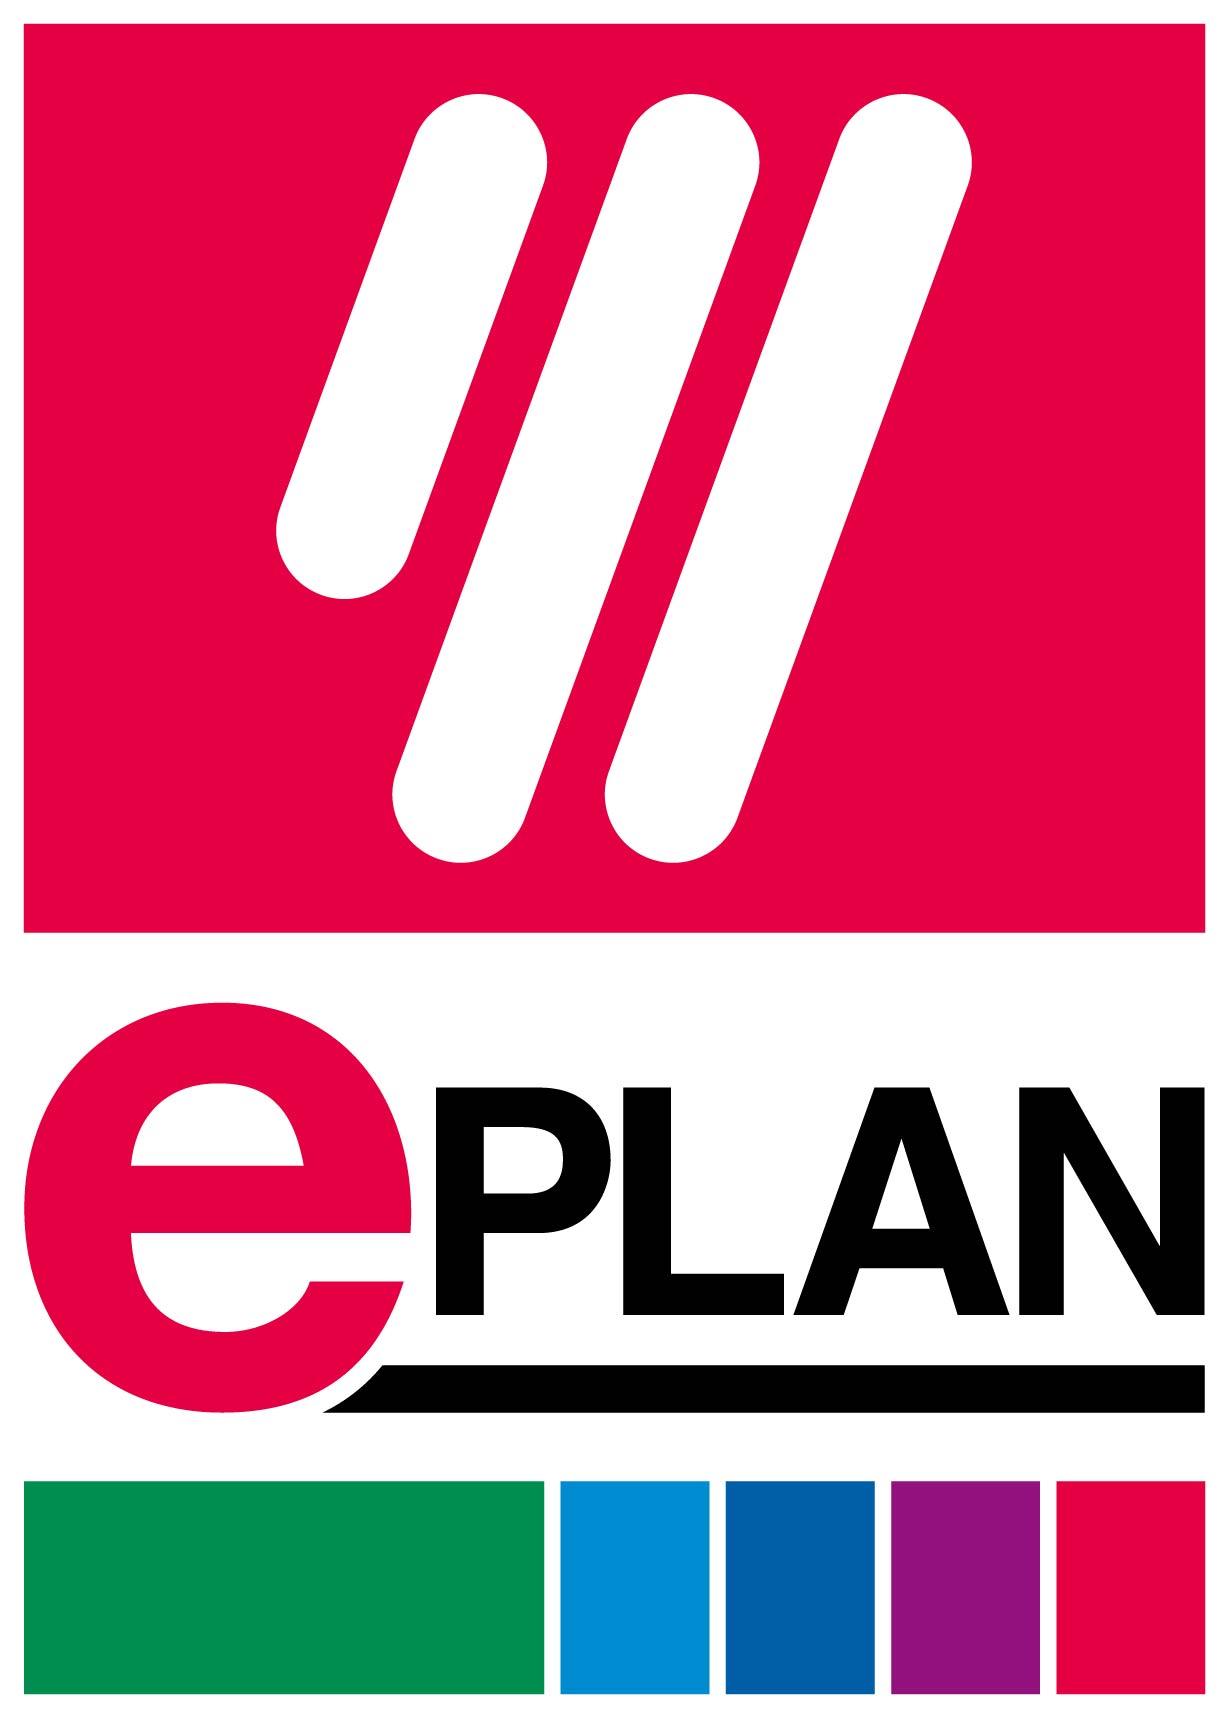 EPLAN Software & Services 株式会社